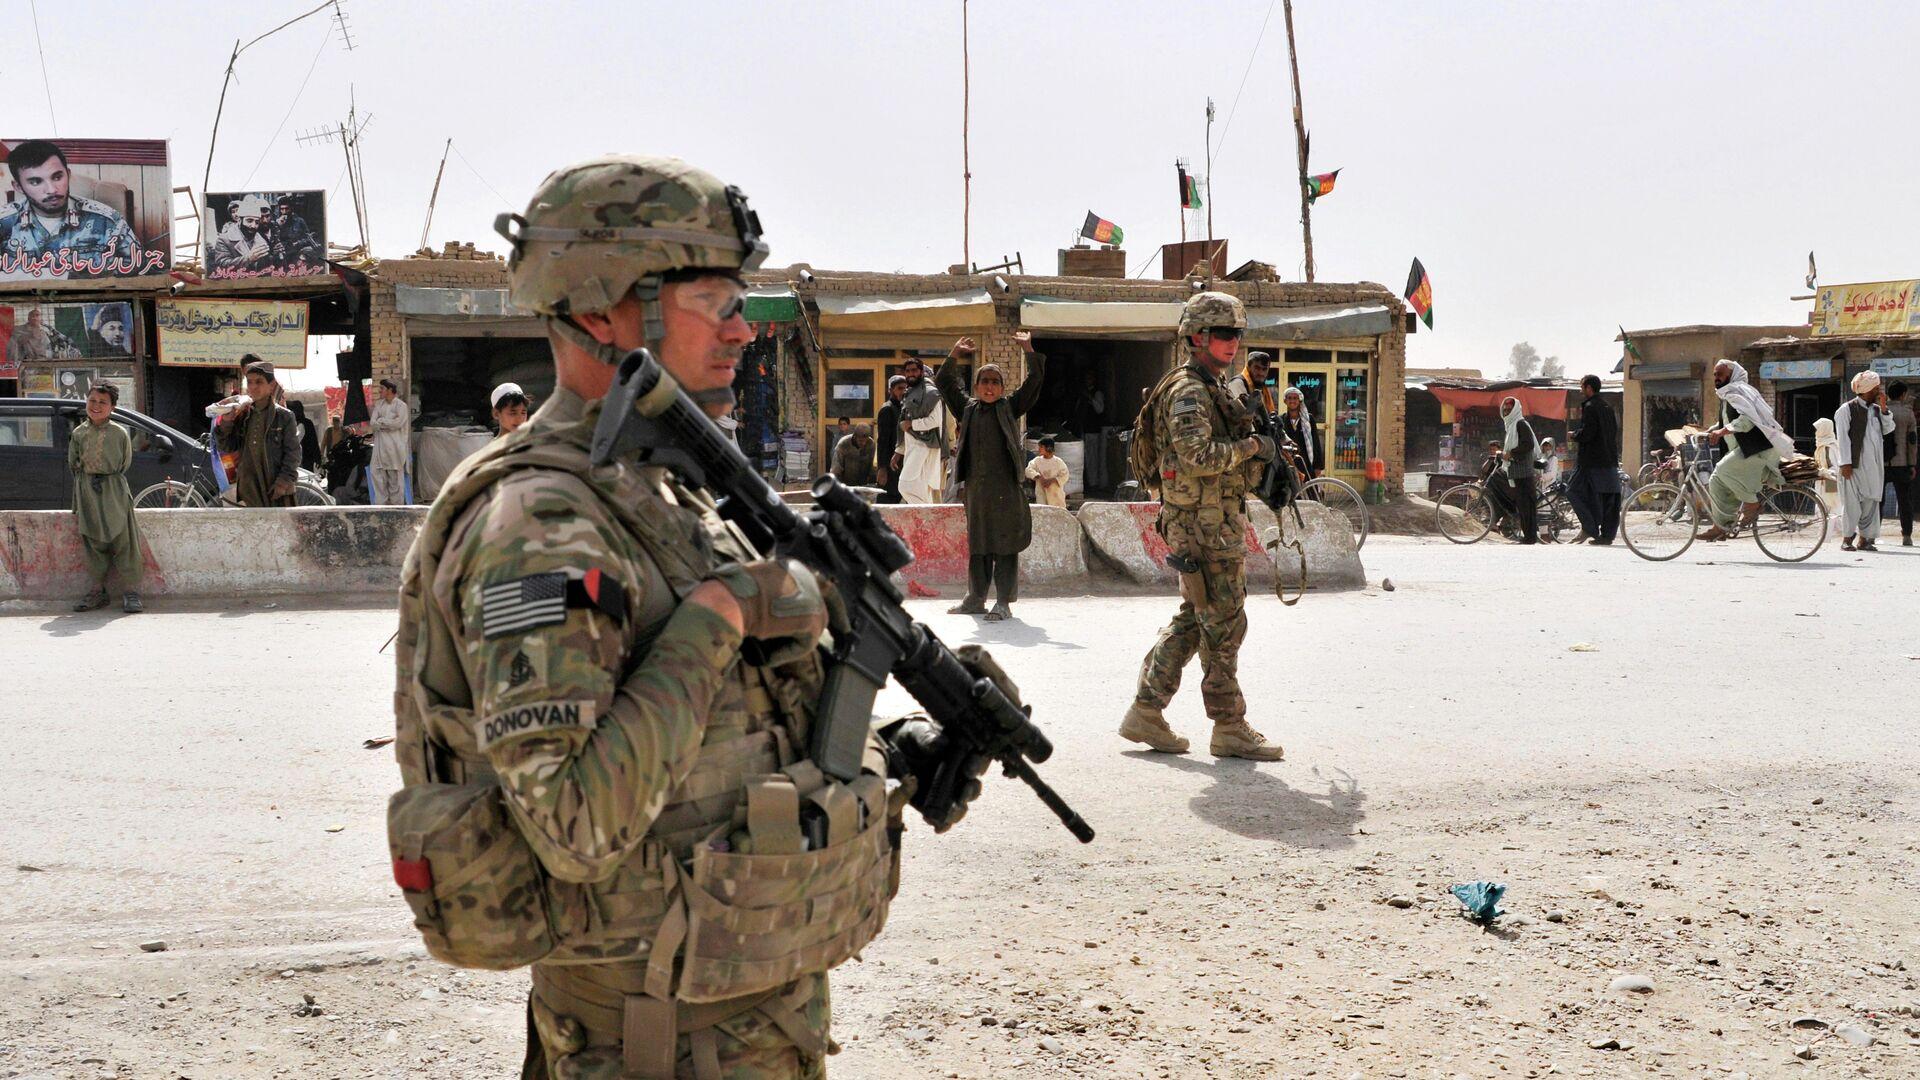 Militares estadounidenses en Afganistán - Sputnik Mundo, 1920, 17.08.2021